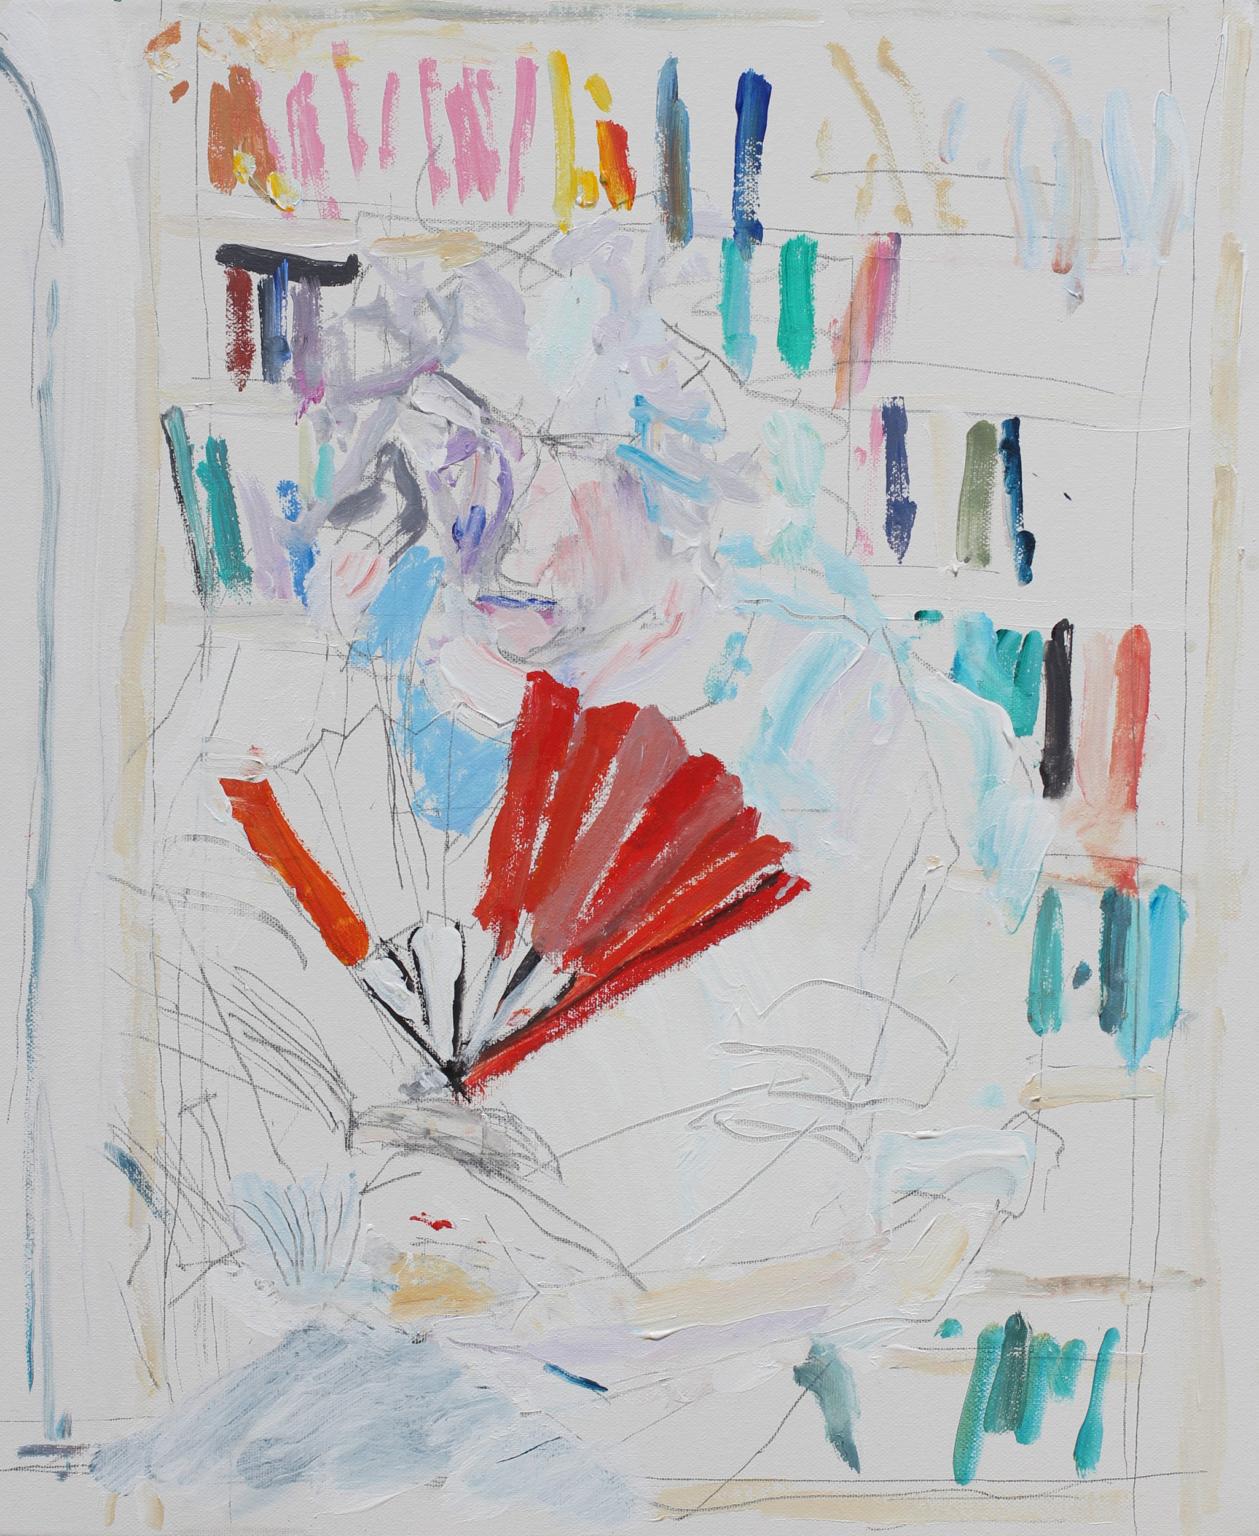 Nick Trench, Caroline with Fan III (2018), Acrylic on canvas, 51 x 61 cm